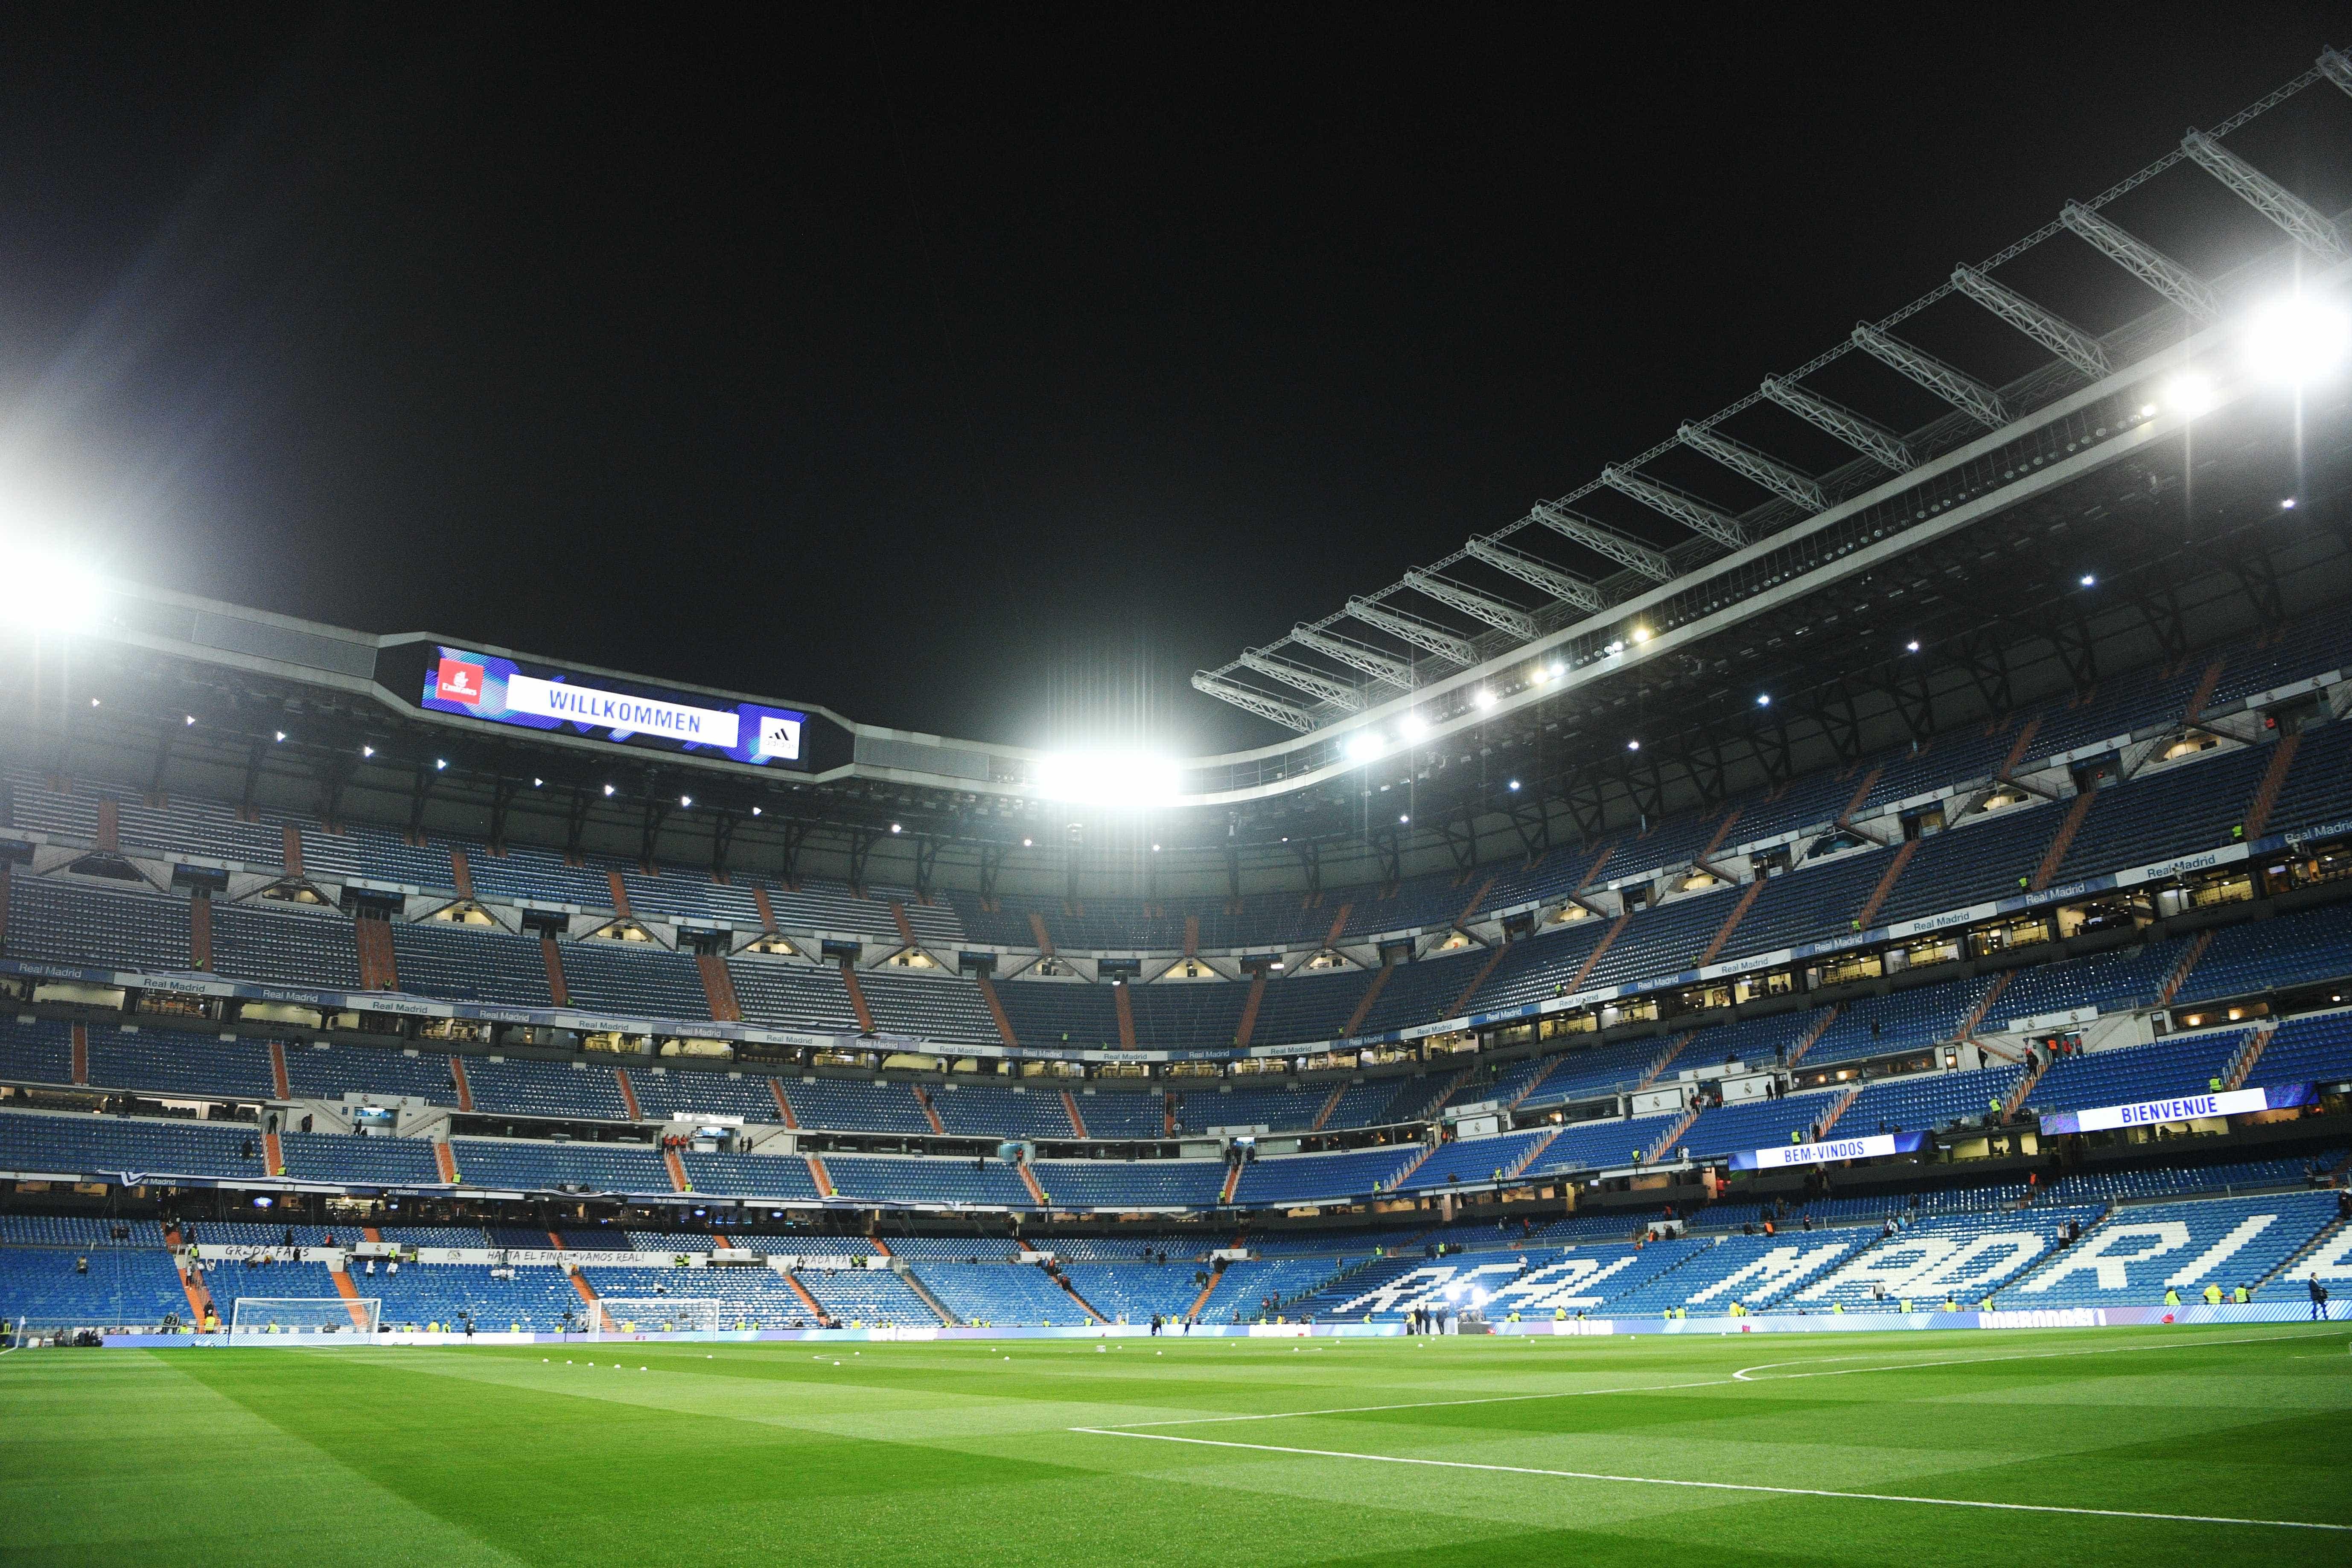 Os nomes que lideram a 'debandada' do Santiago Bernabéu